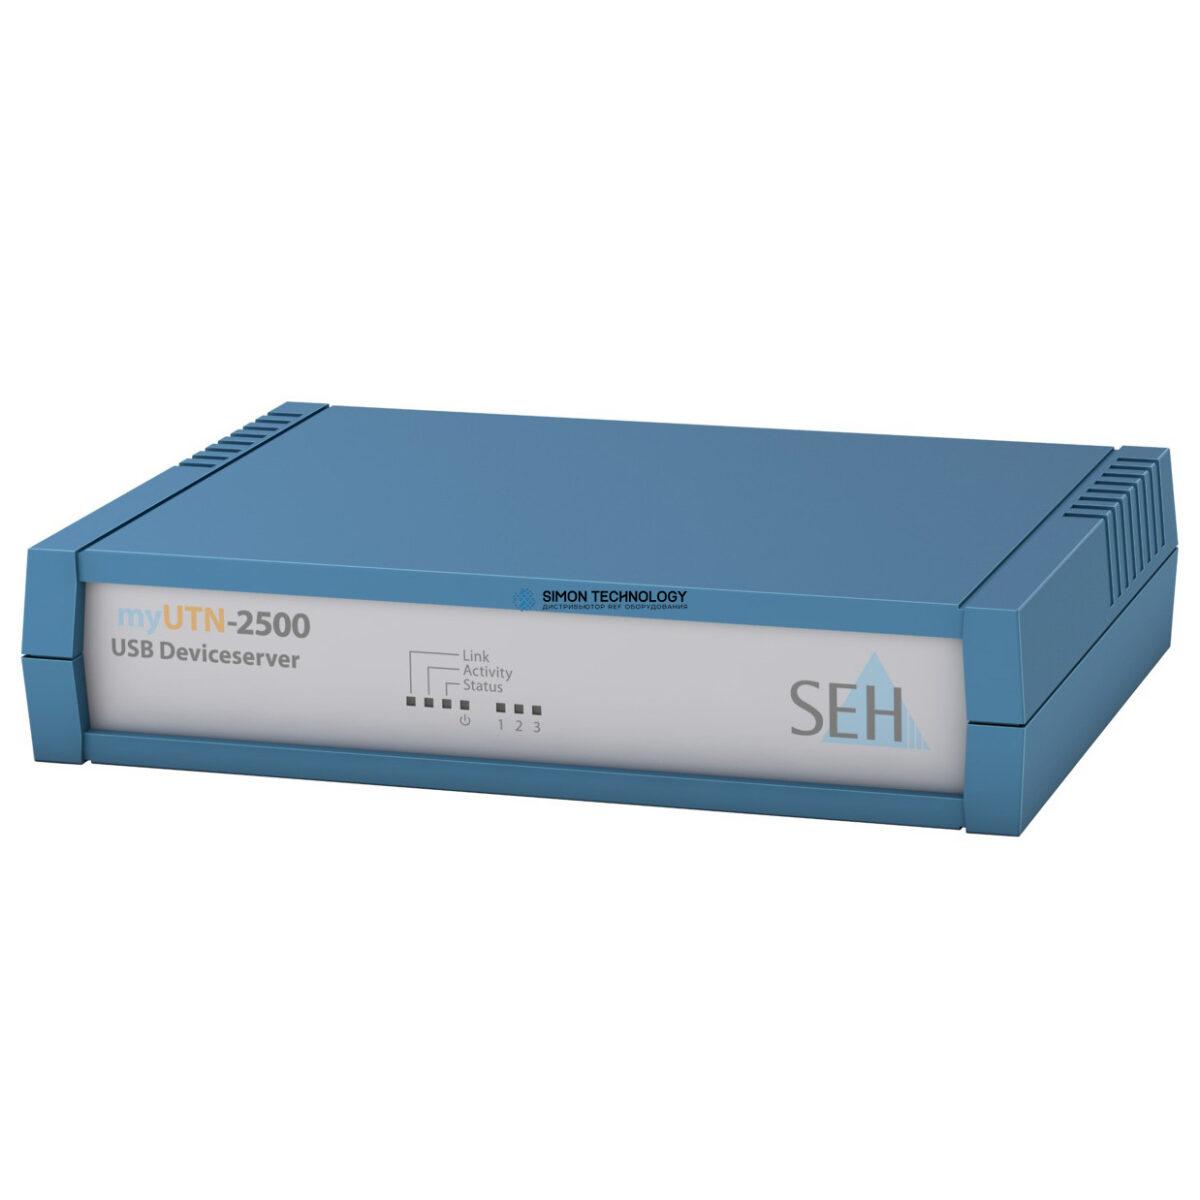 SEH - myUTN-2500 (EU) USB Device Server (M05080)